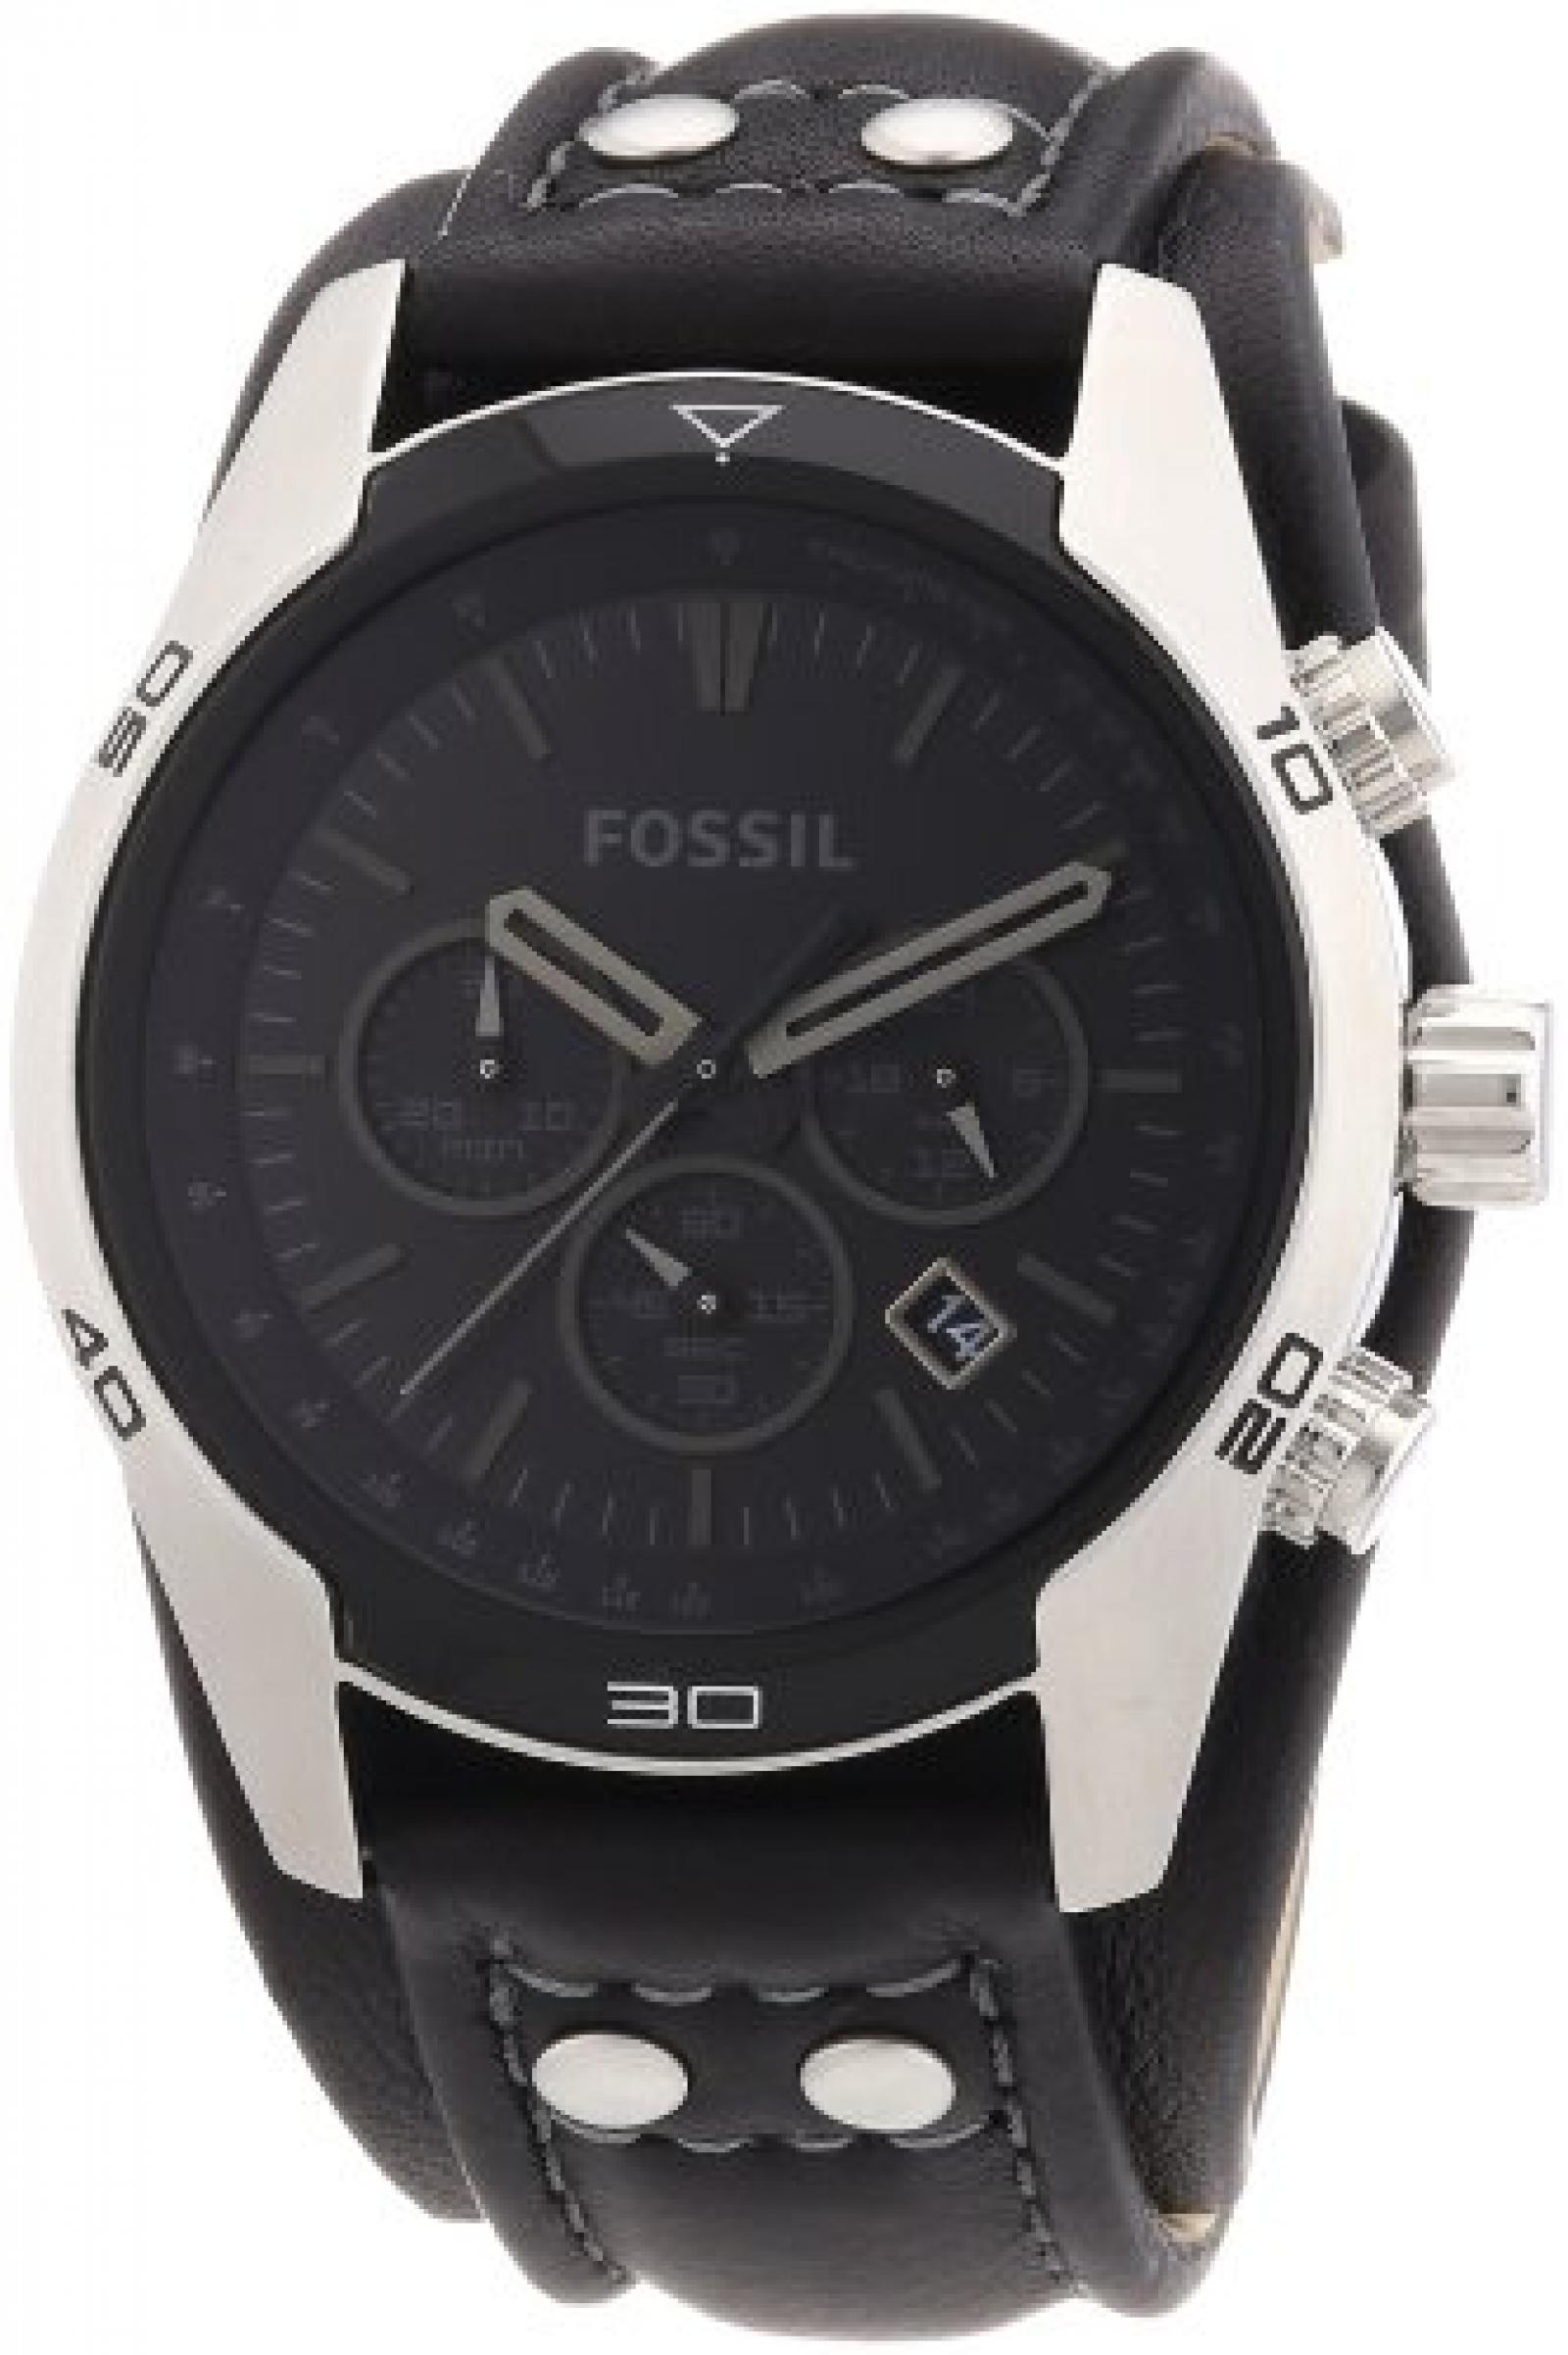 Fossil Herren-Armbanduhr Sport Leder schwarz Chronograph Quarz CH2586